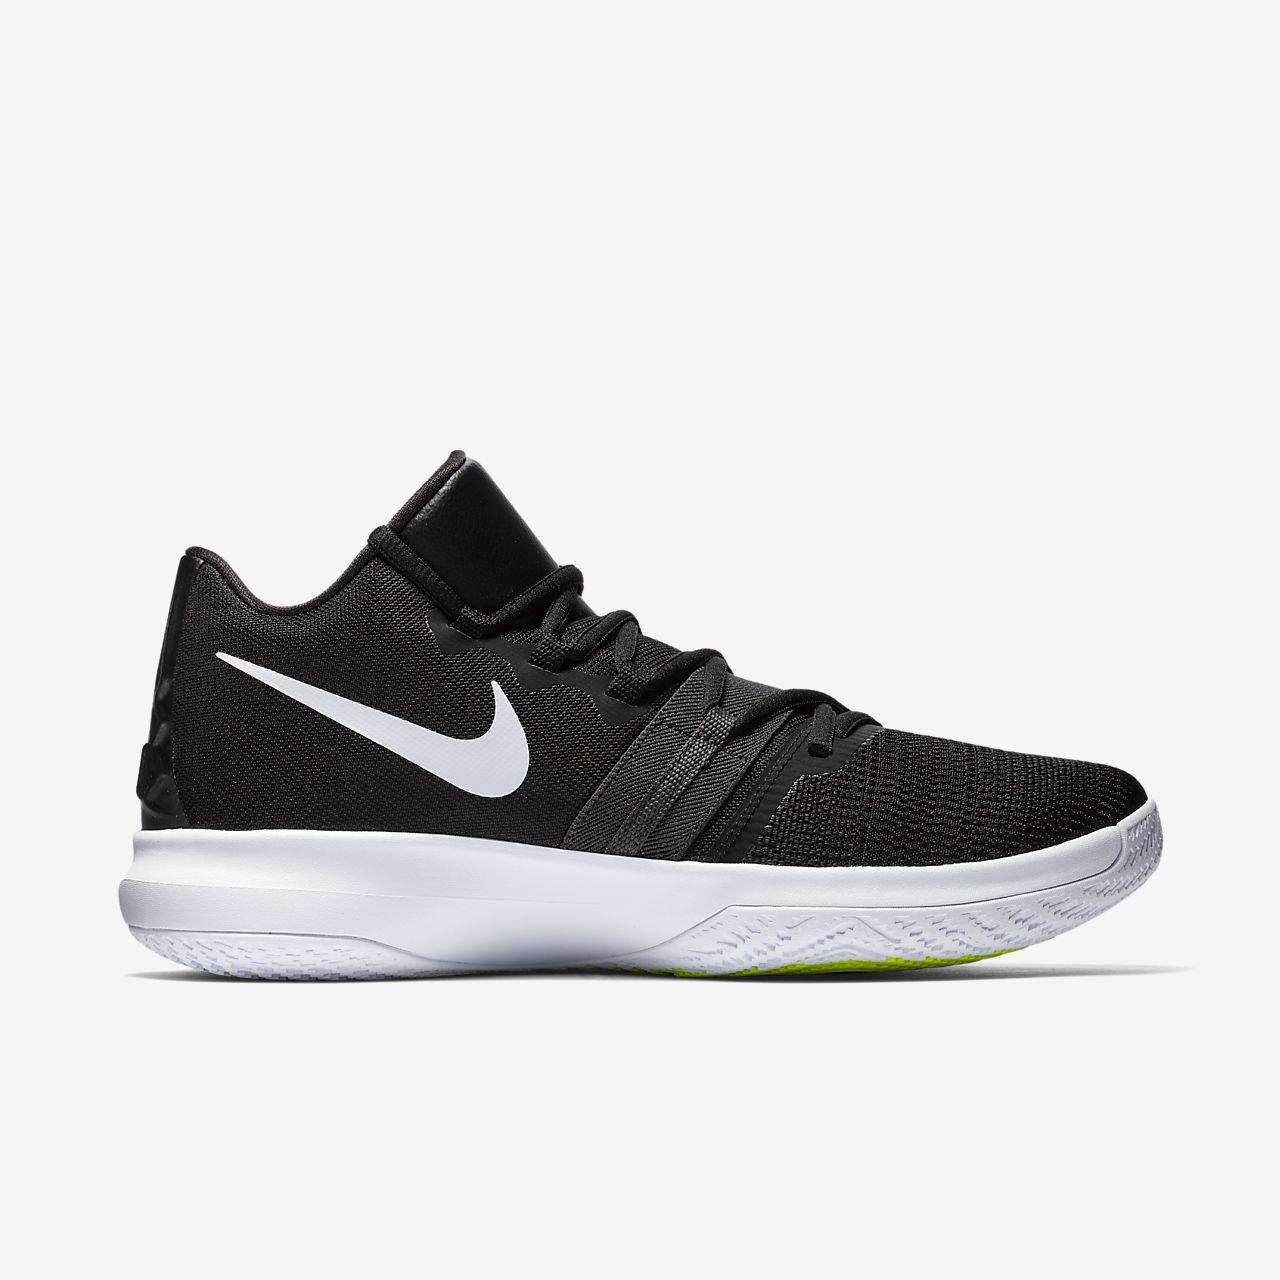 Calzado de básquetbol para hombre Kyrie Flytrap. Nike.com MX 15a3e087a